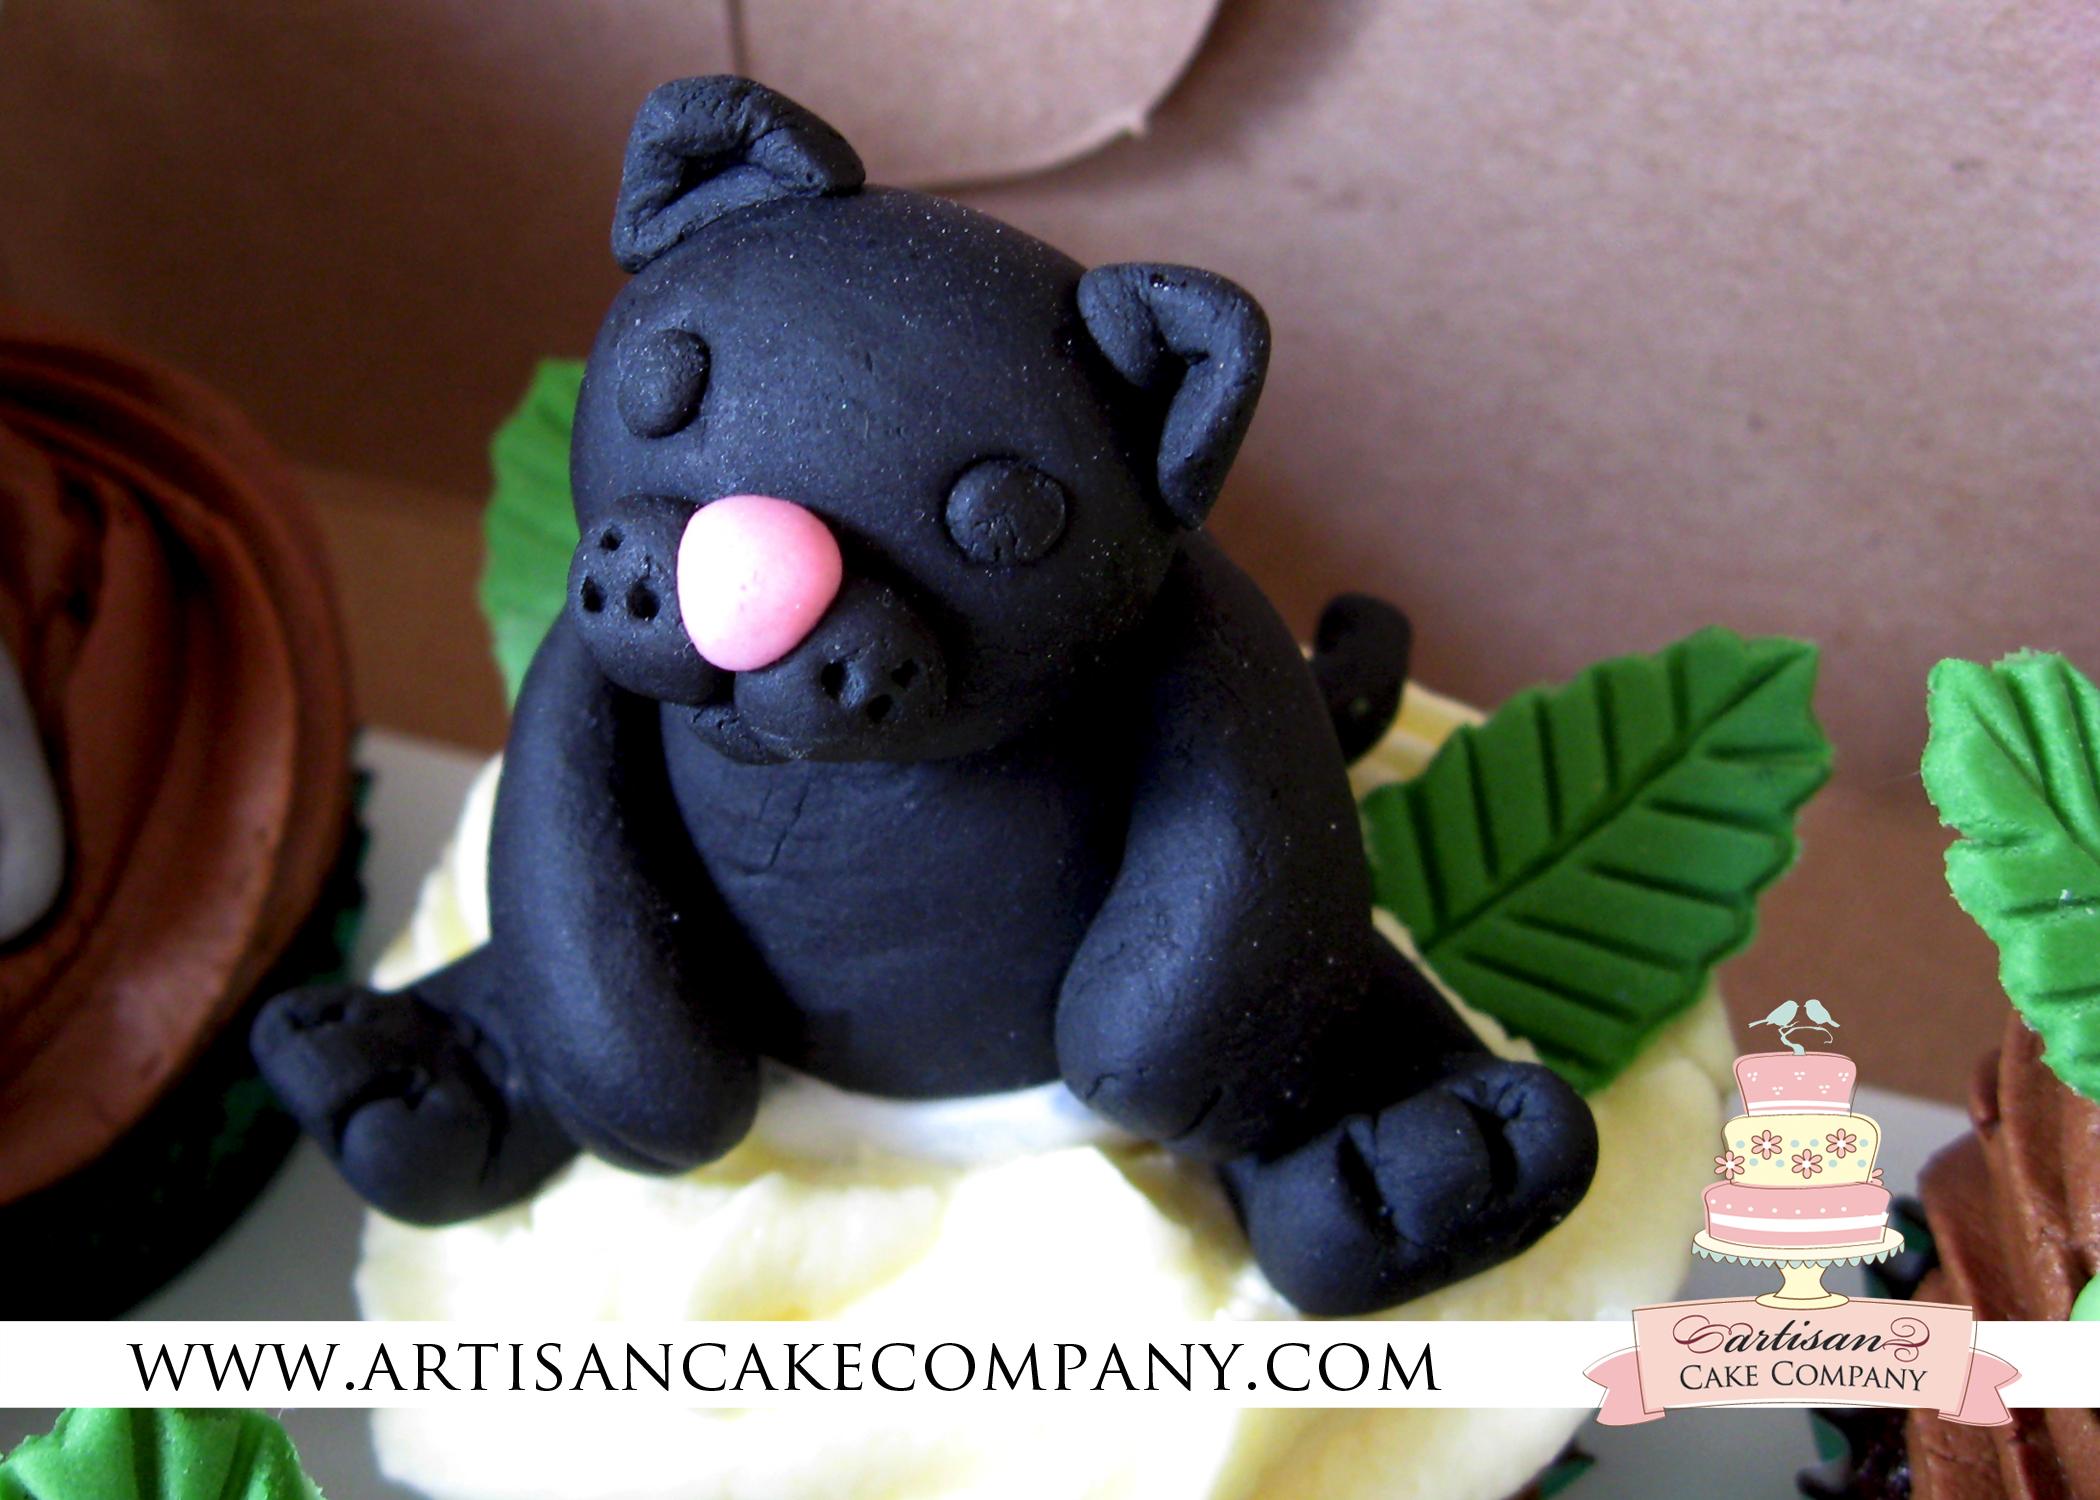 Artisan Cake Recipes